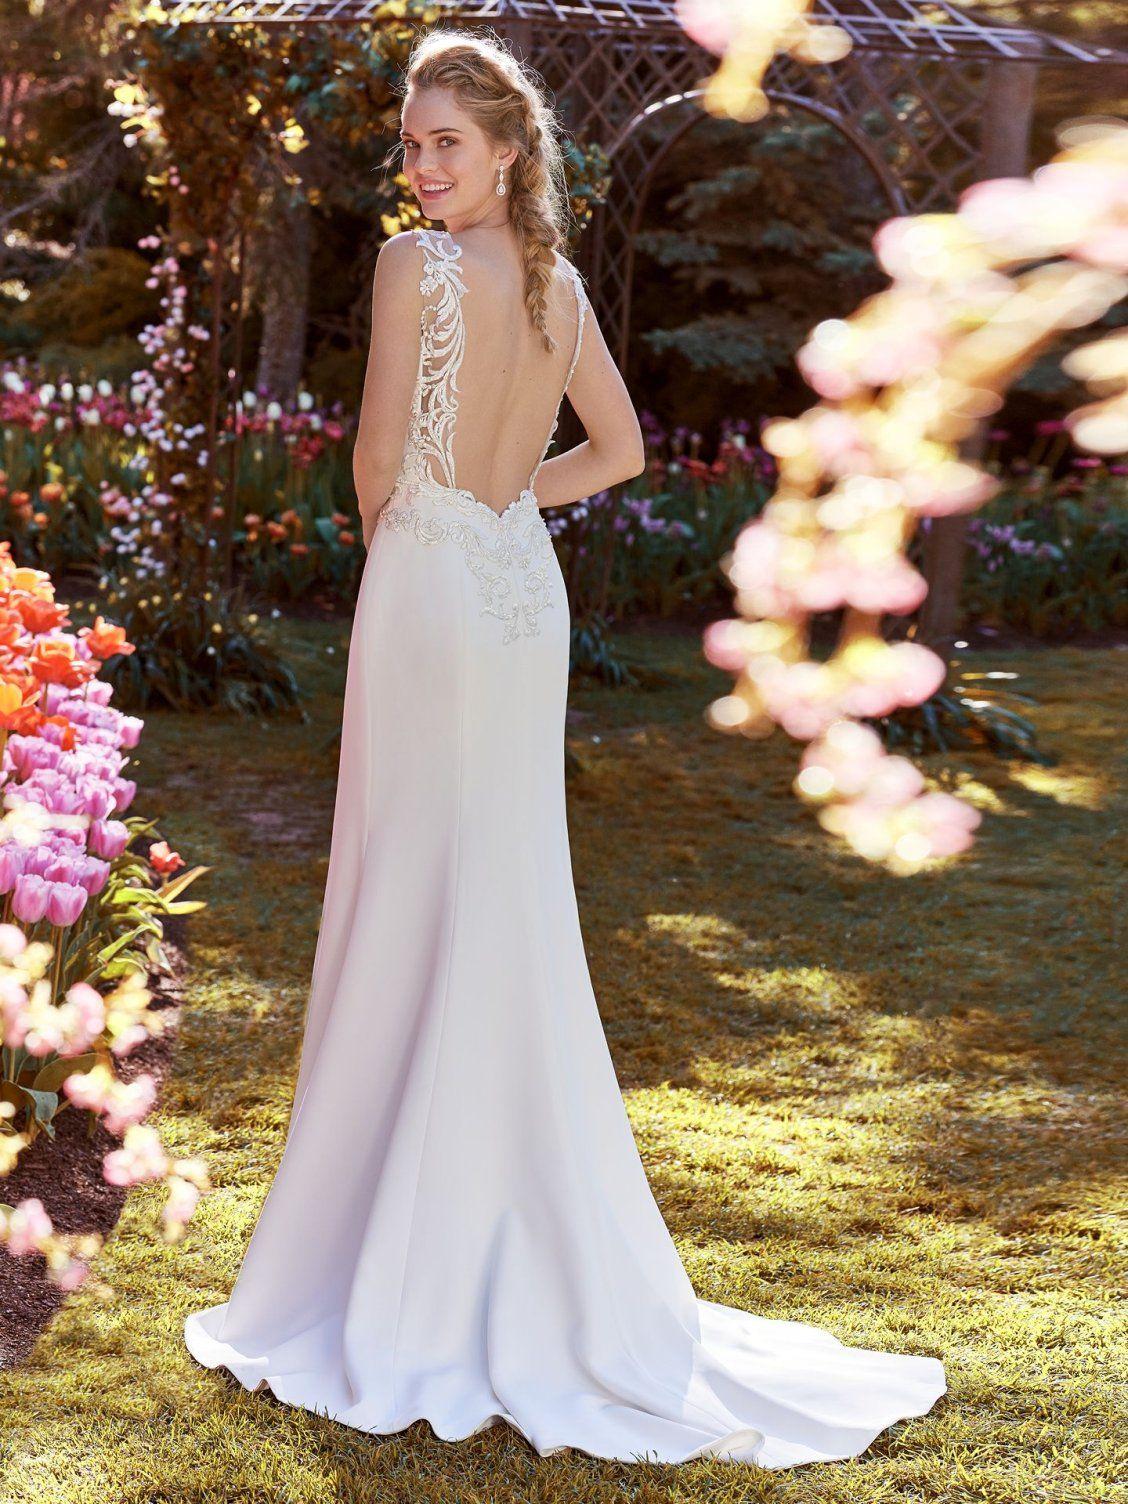 Olivia Bottega 2018 Wedding Dresses   Dresses, Wedding